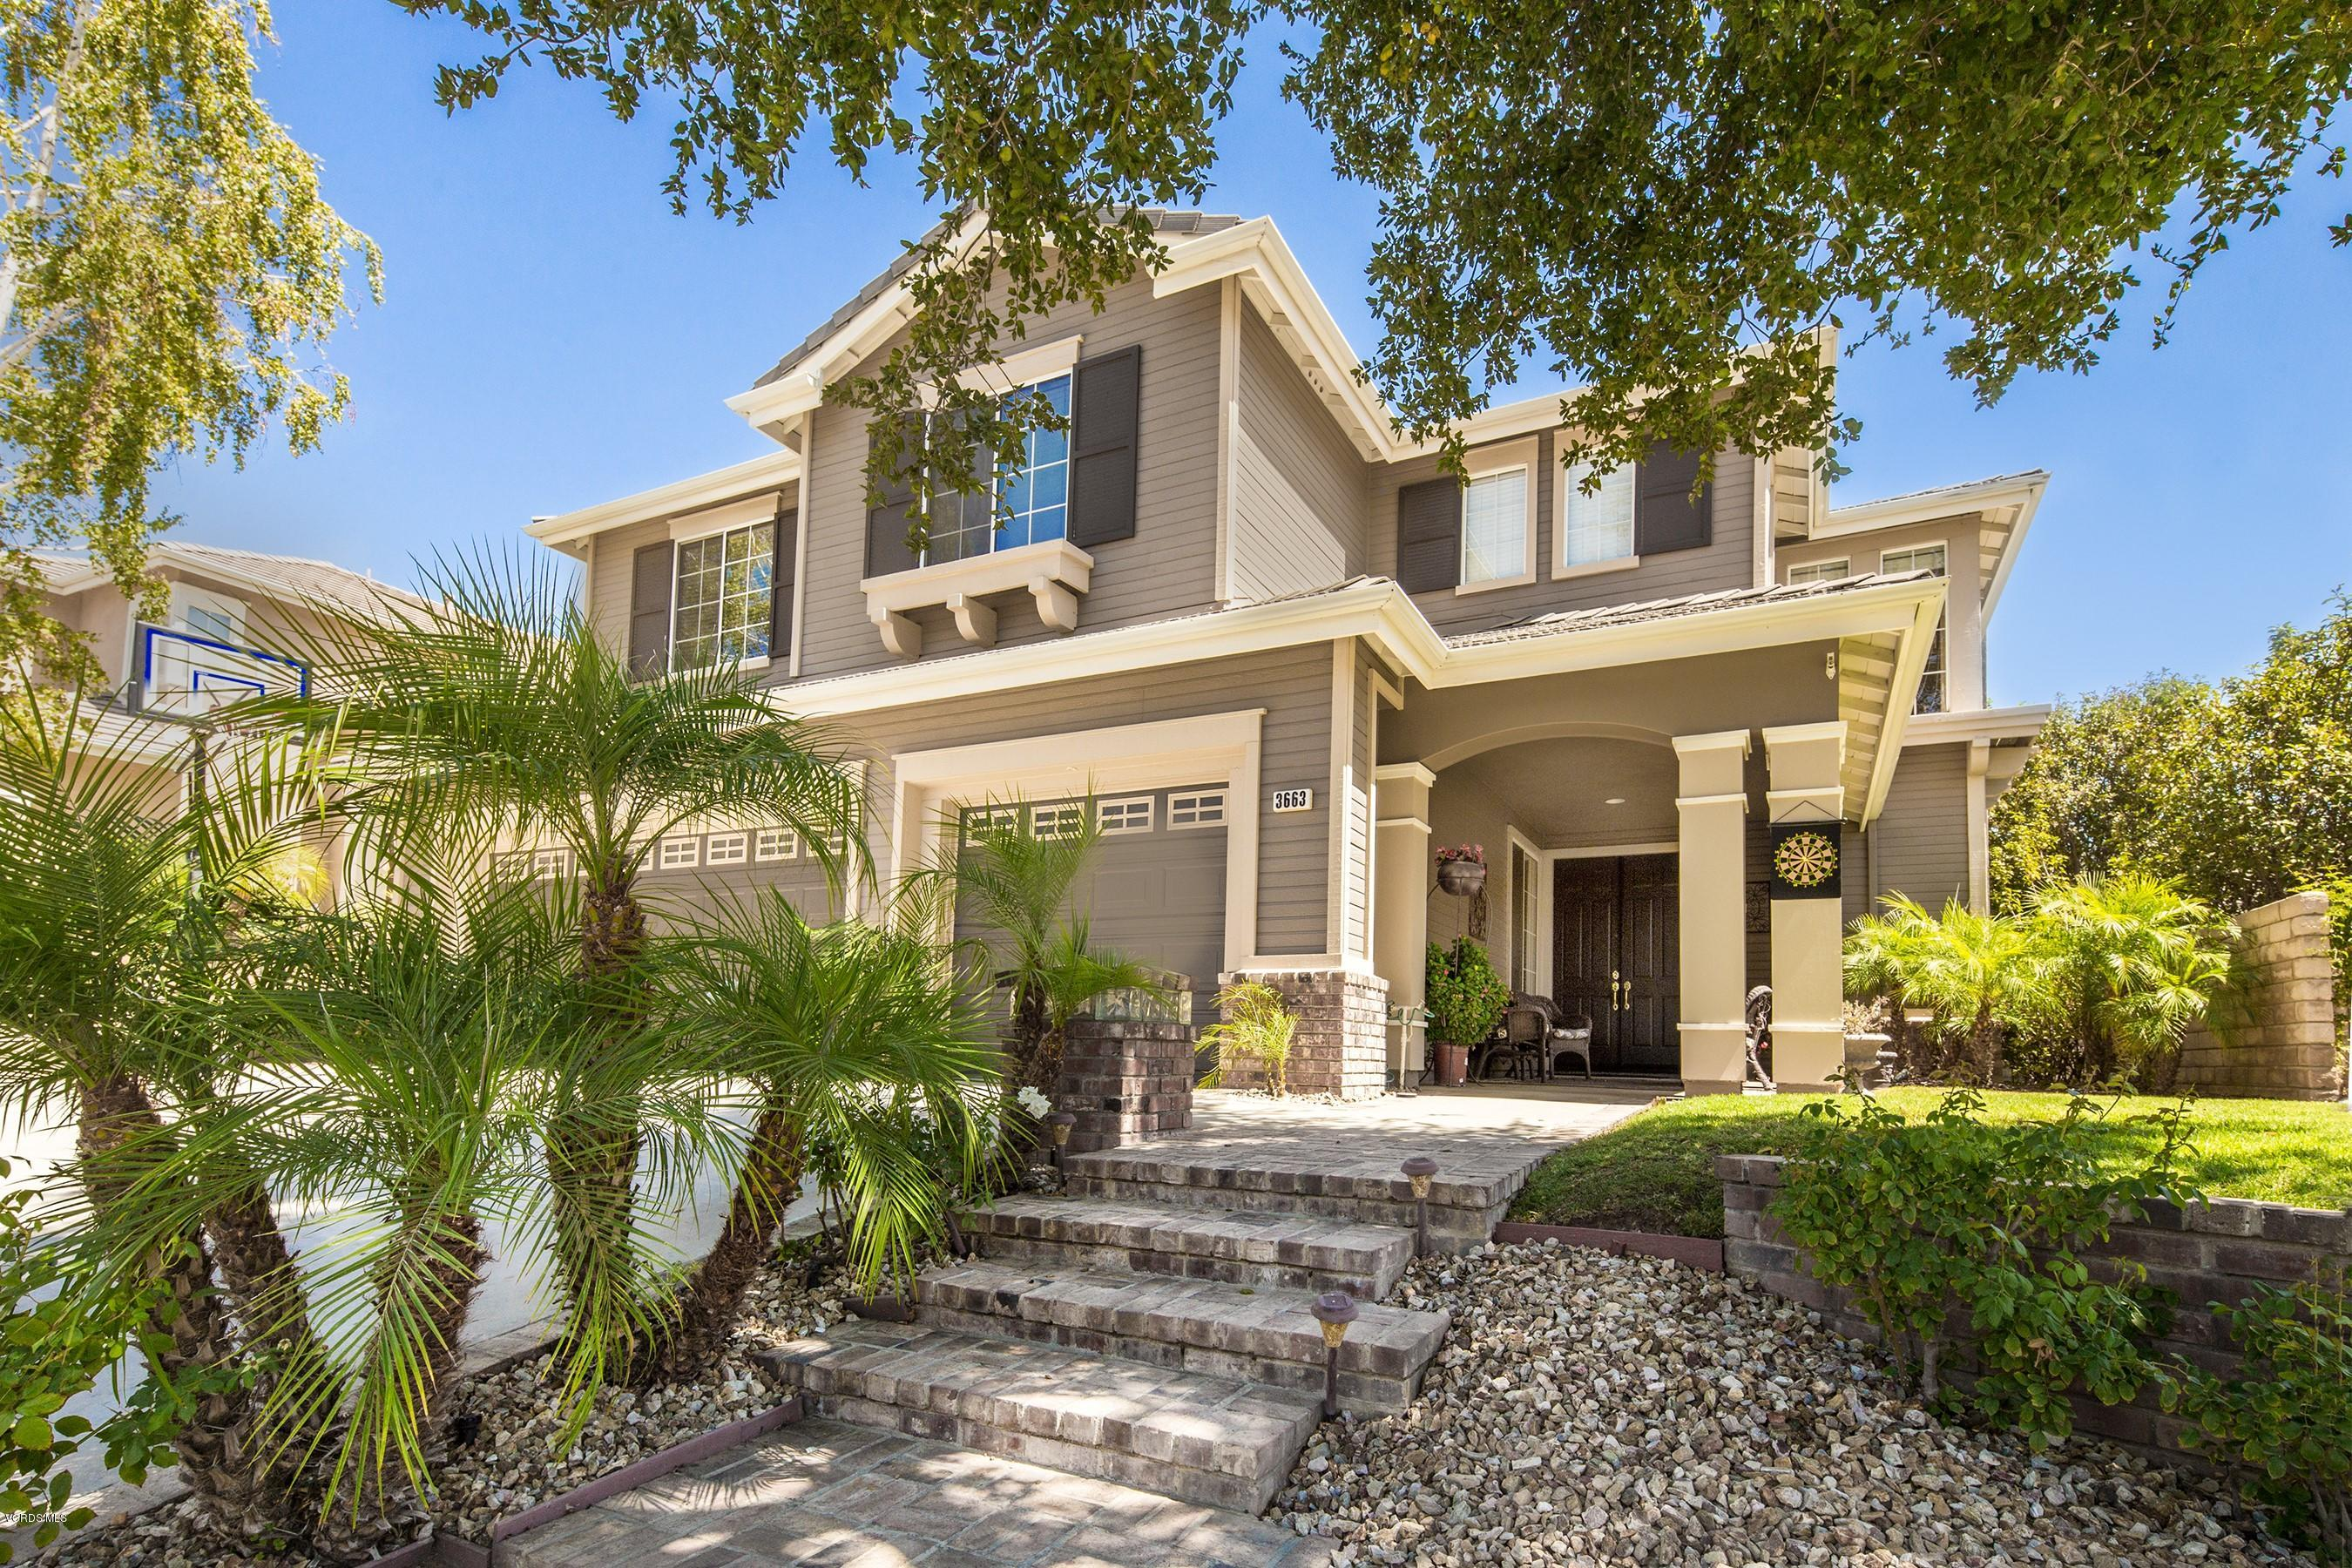 3663 Lang Ranch Parkway, Thousand Oaks, CA 91362